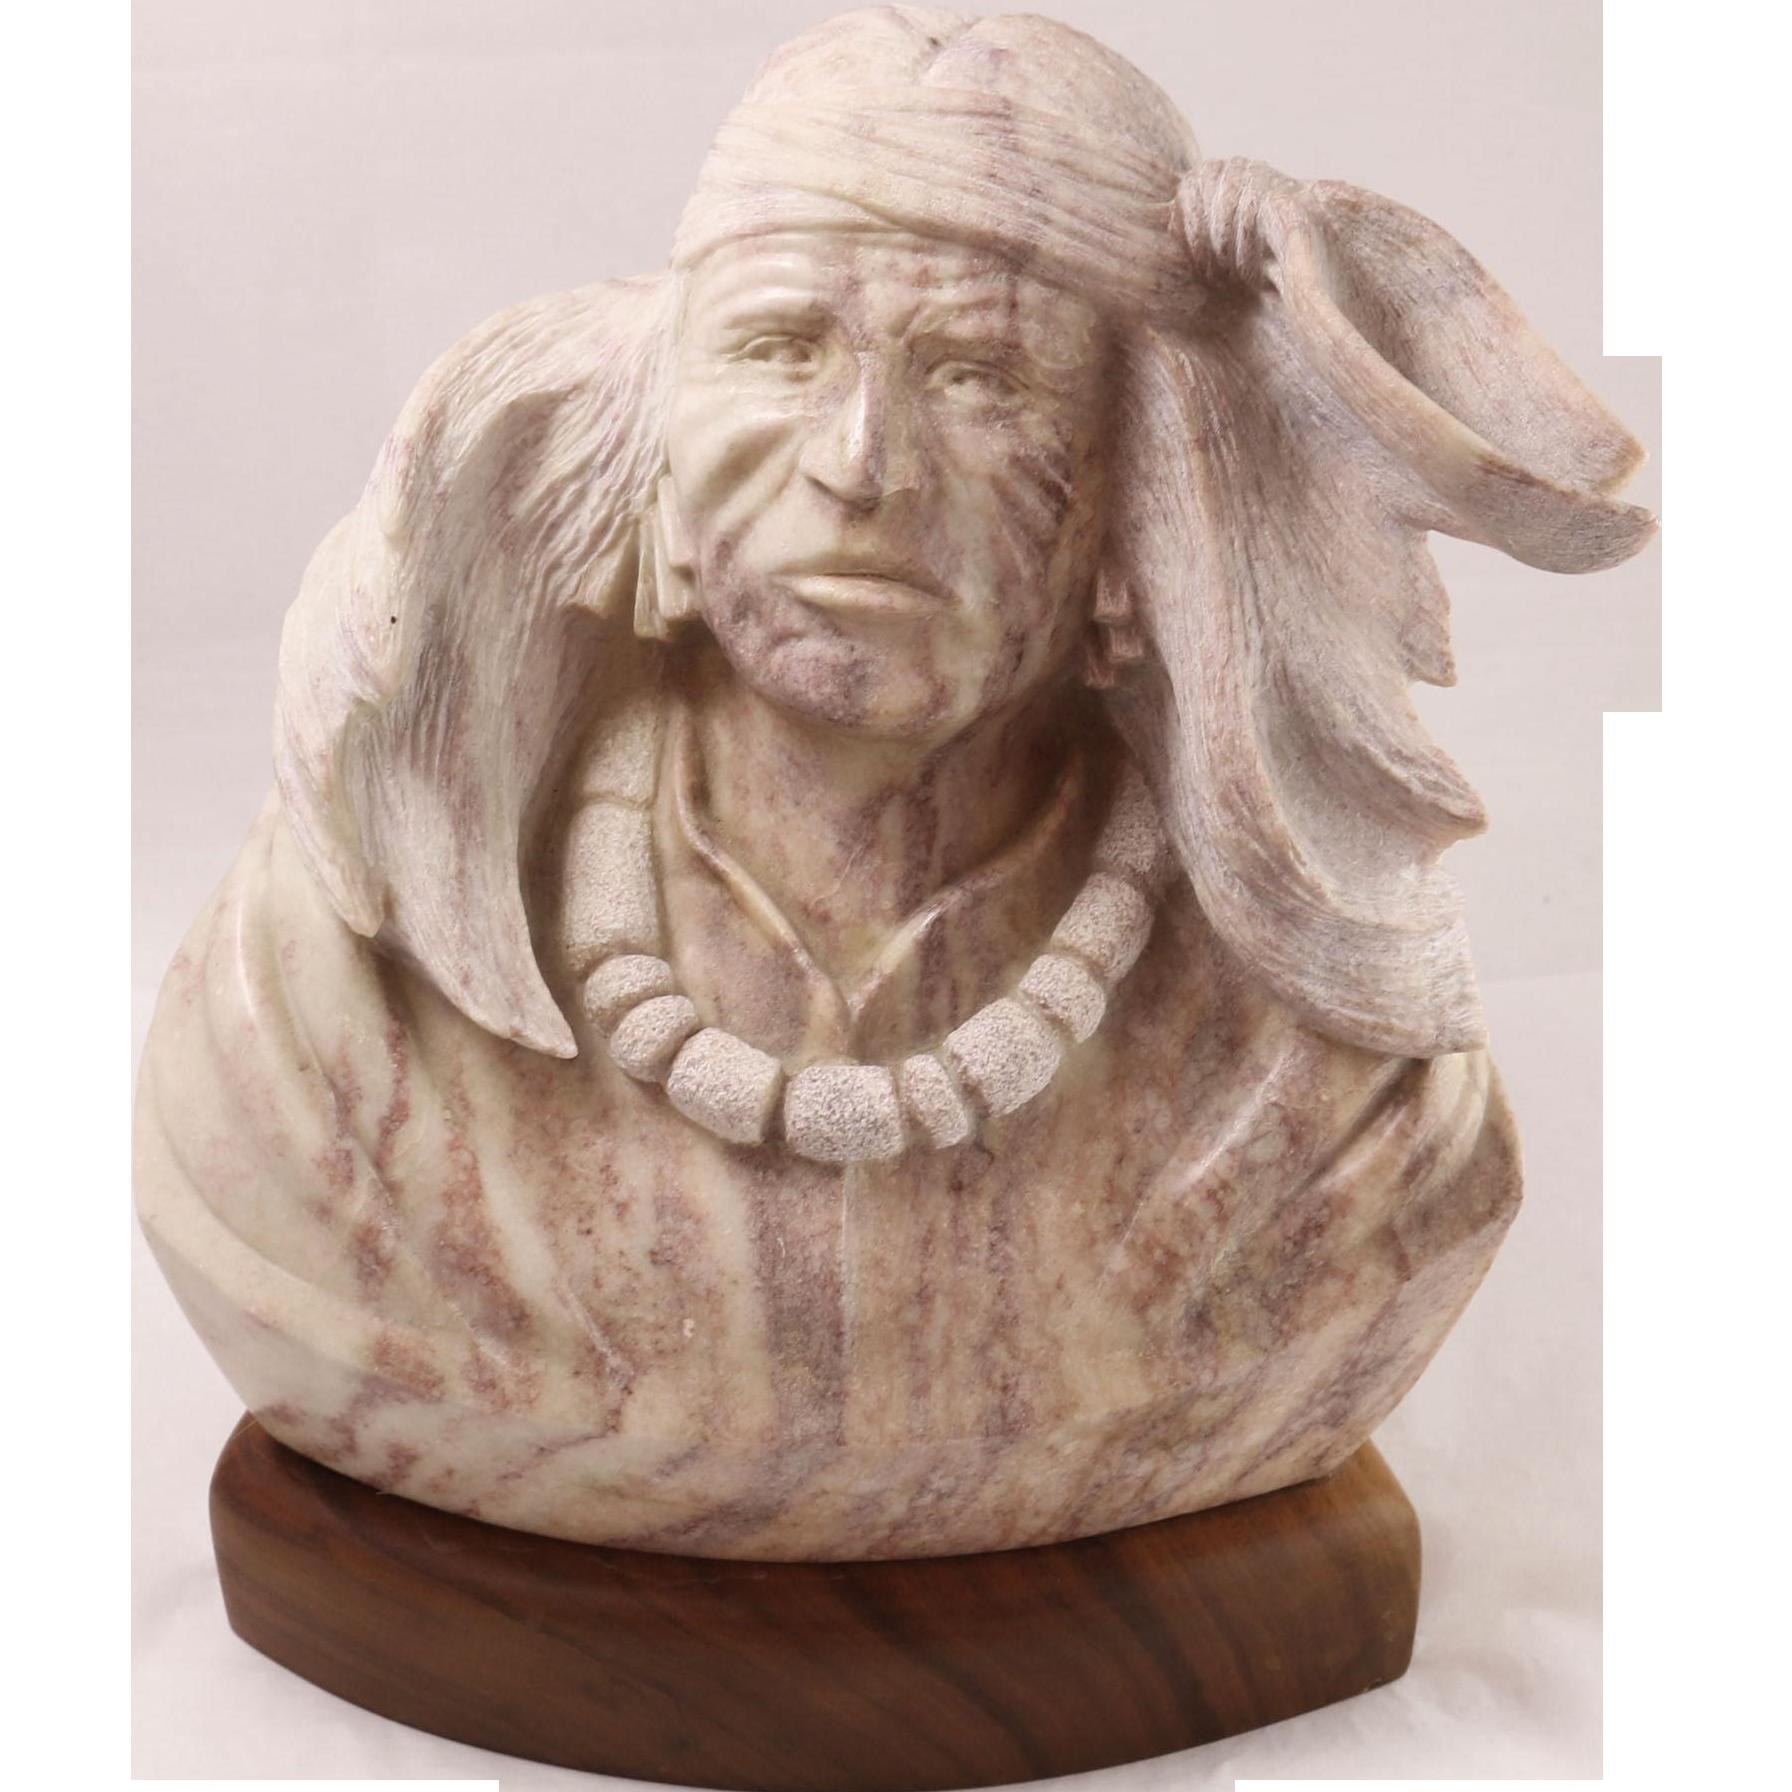 Beautiful vandu hard stone carving of native american from